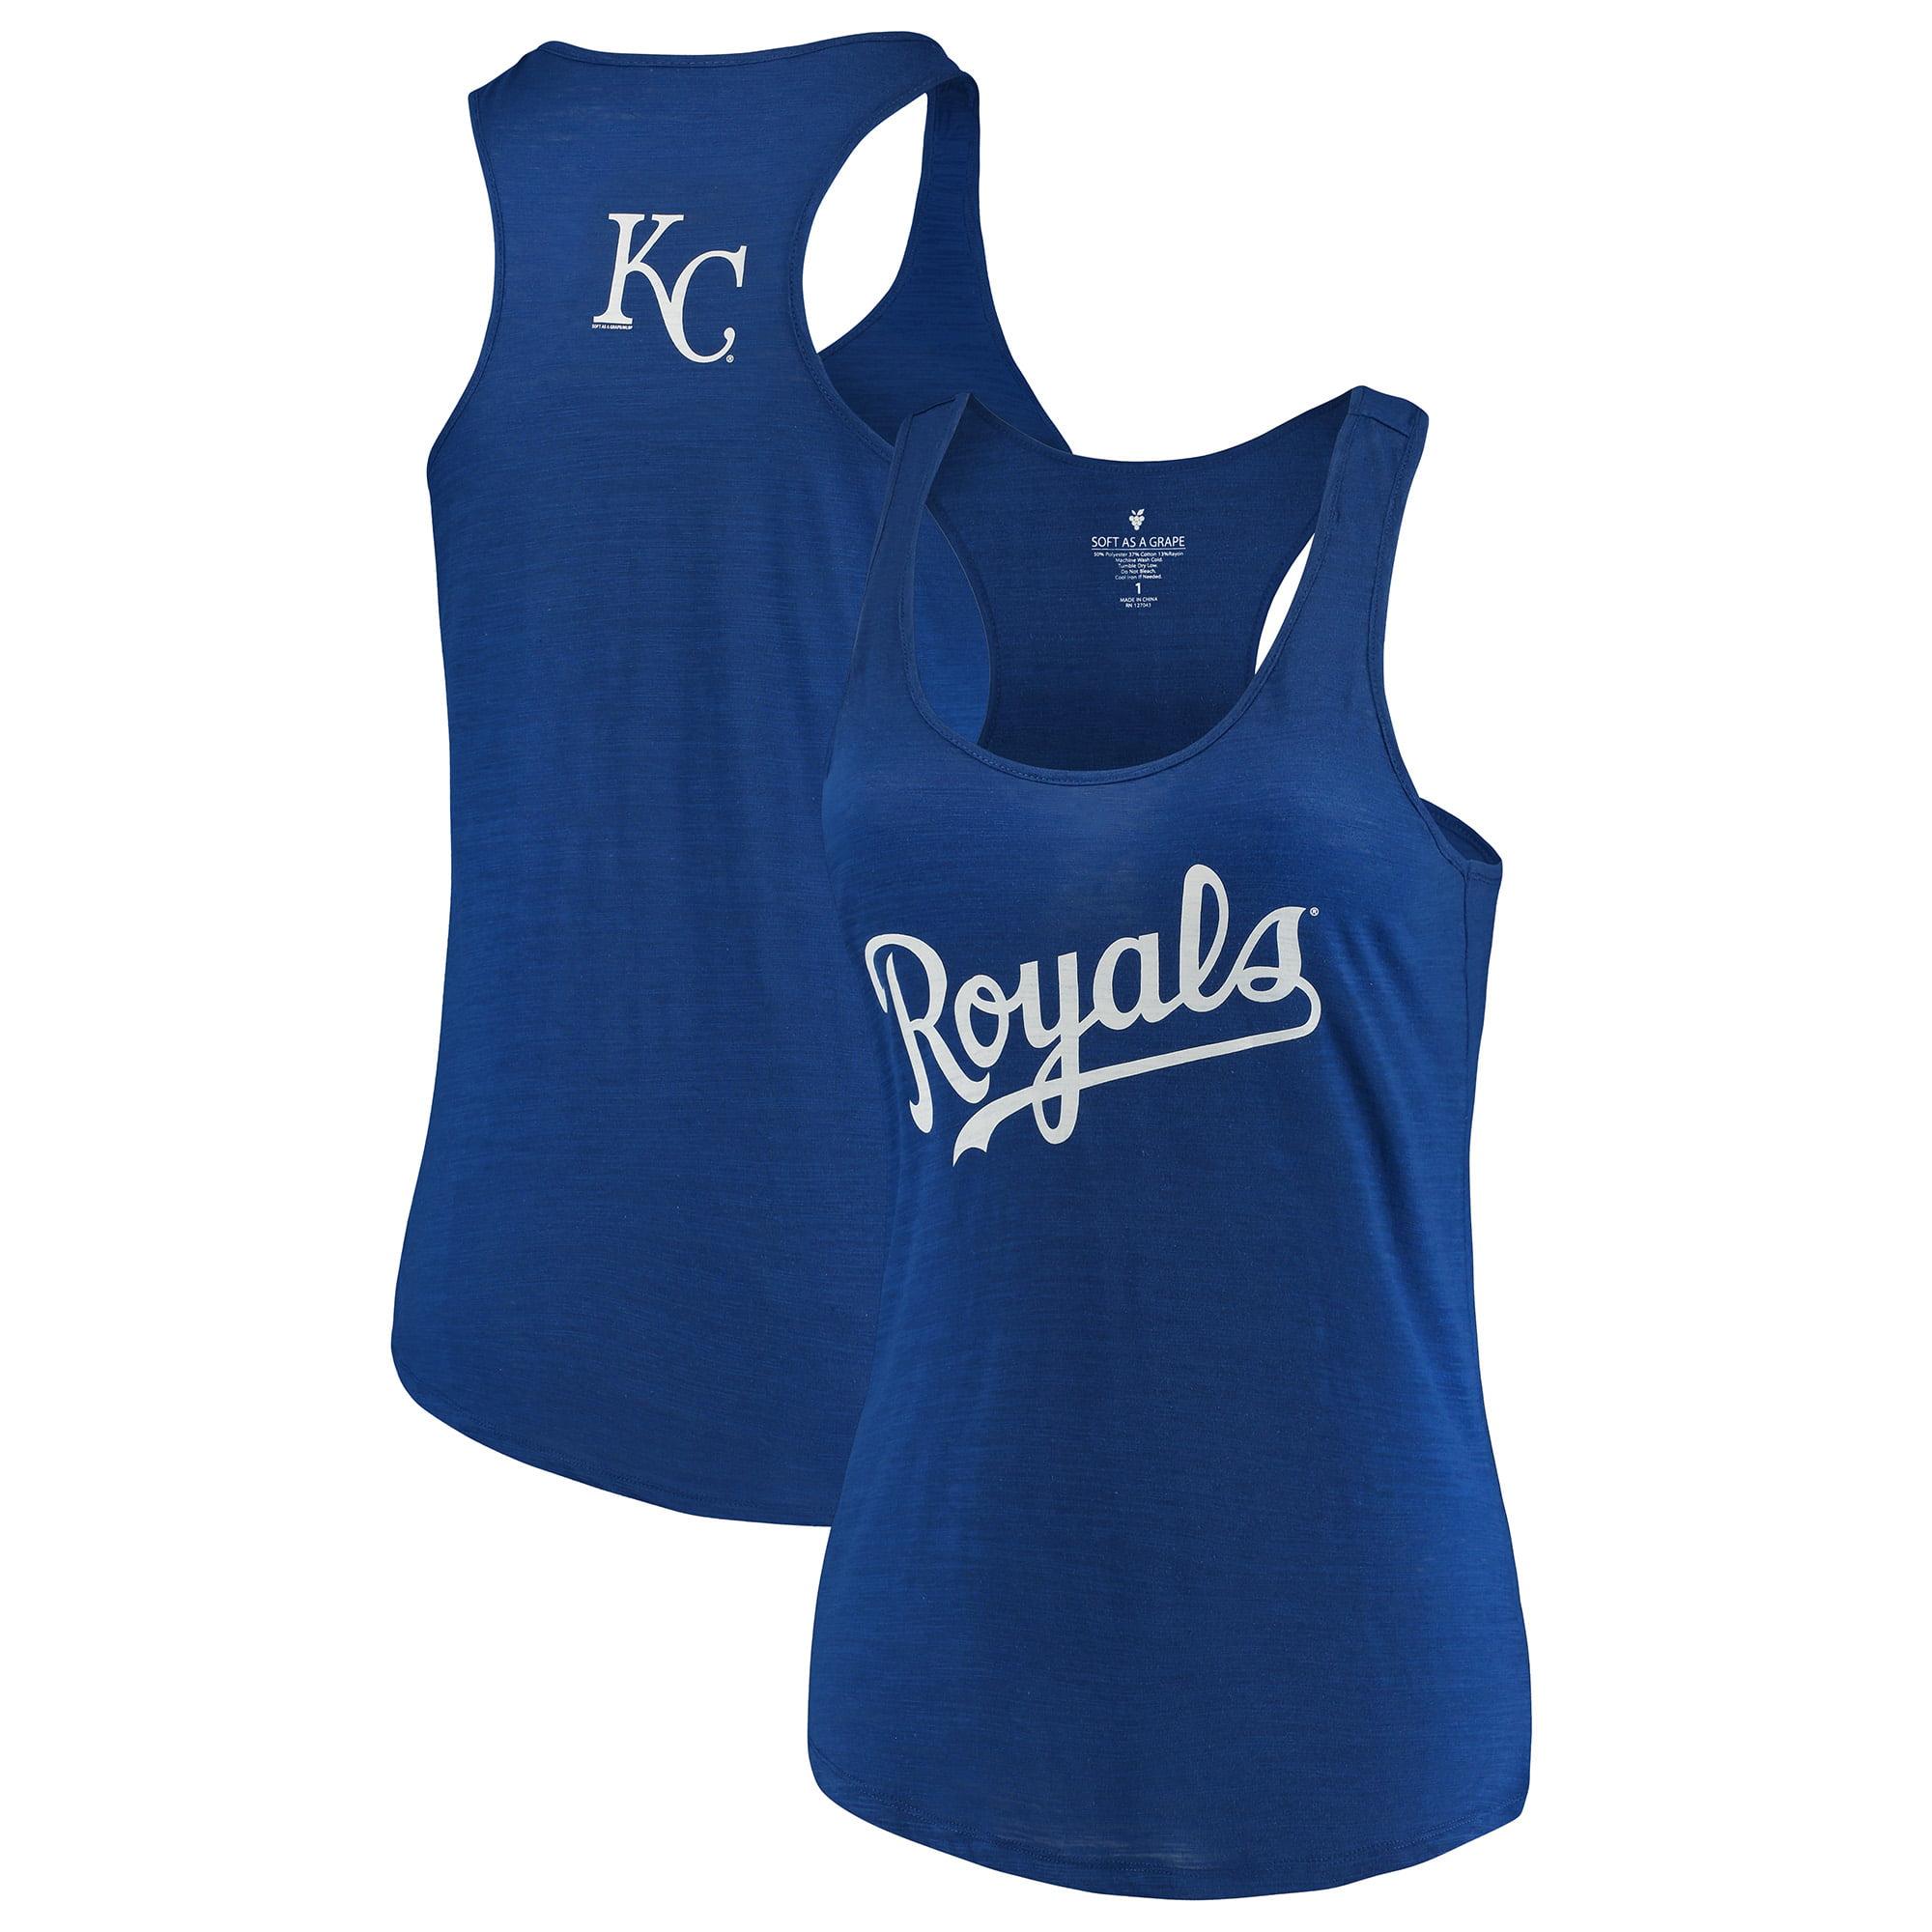 Kansas City Royals Soft as a Grape Women's Plus Size Swing for the Fences Racerback Tank Top - Royal